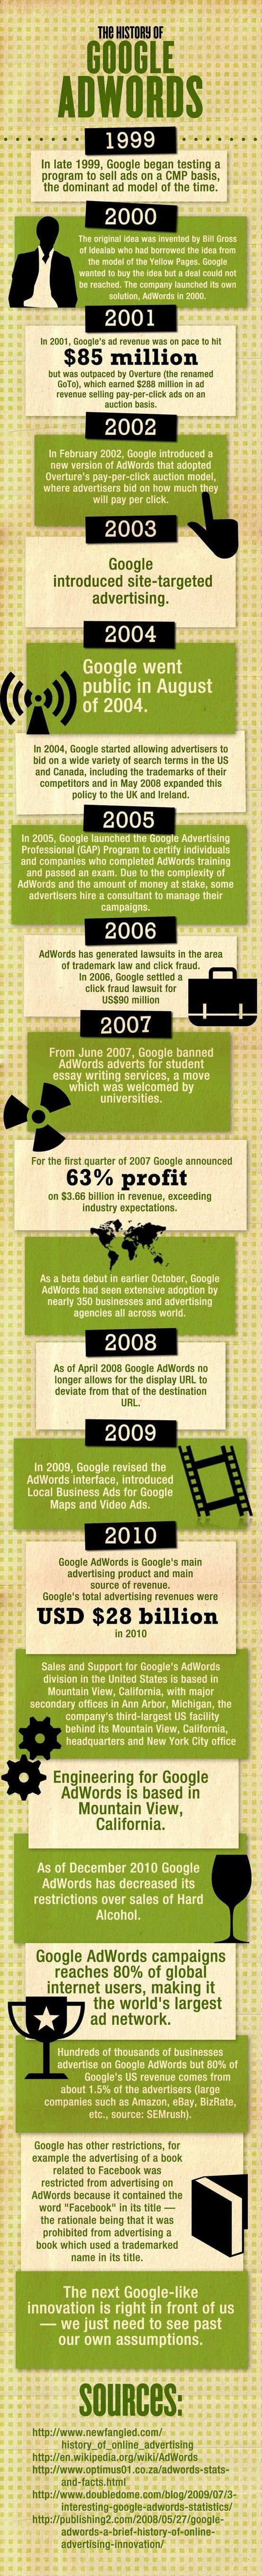 The history of #Google #Adwords #infographic via @eddie_herrera